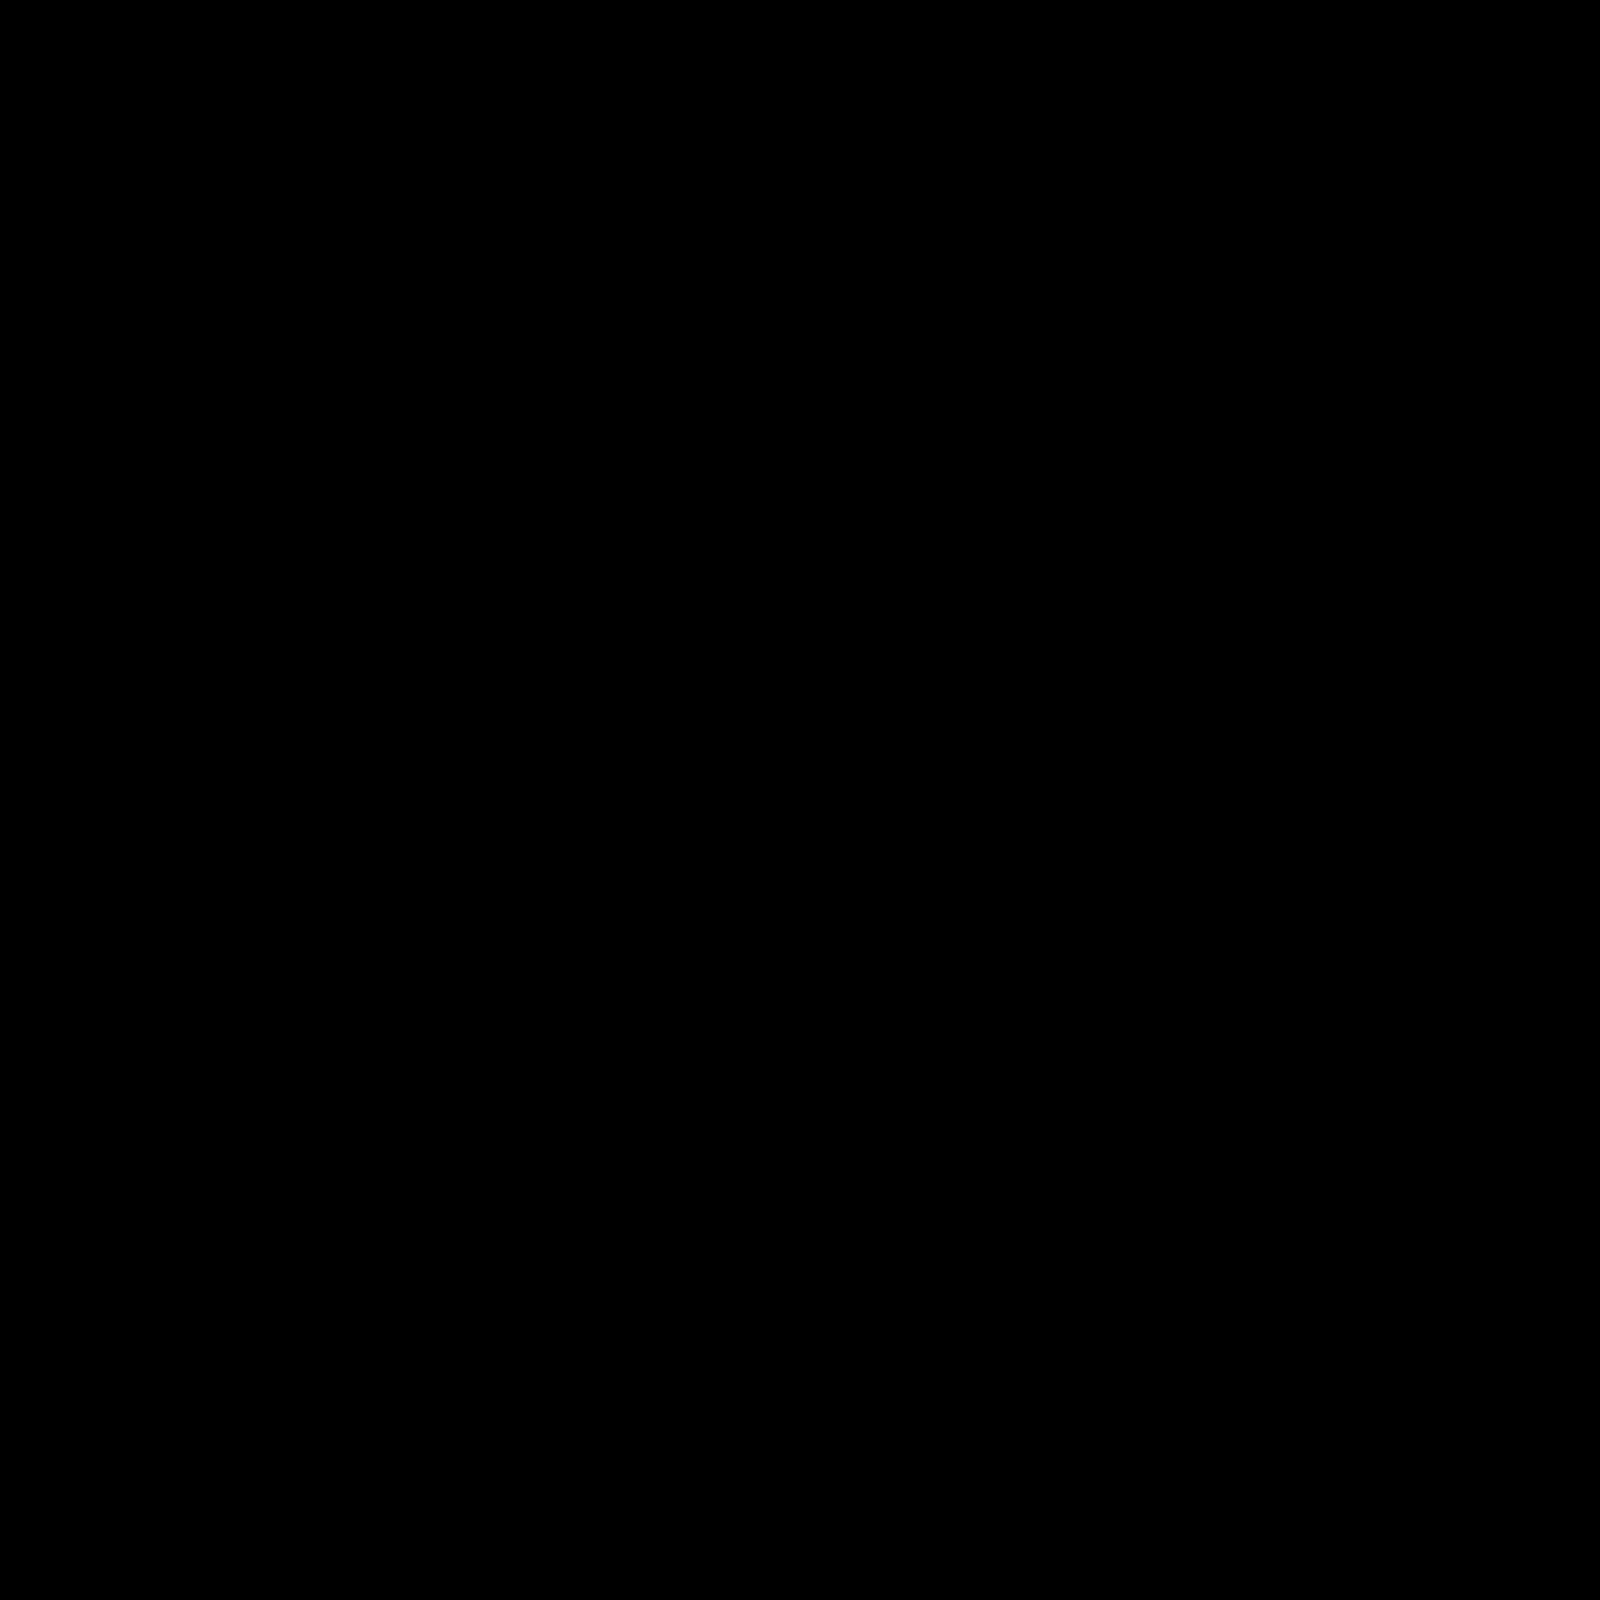 Big Milkshake icon